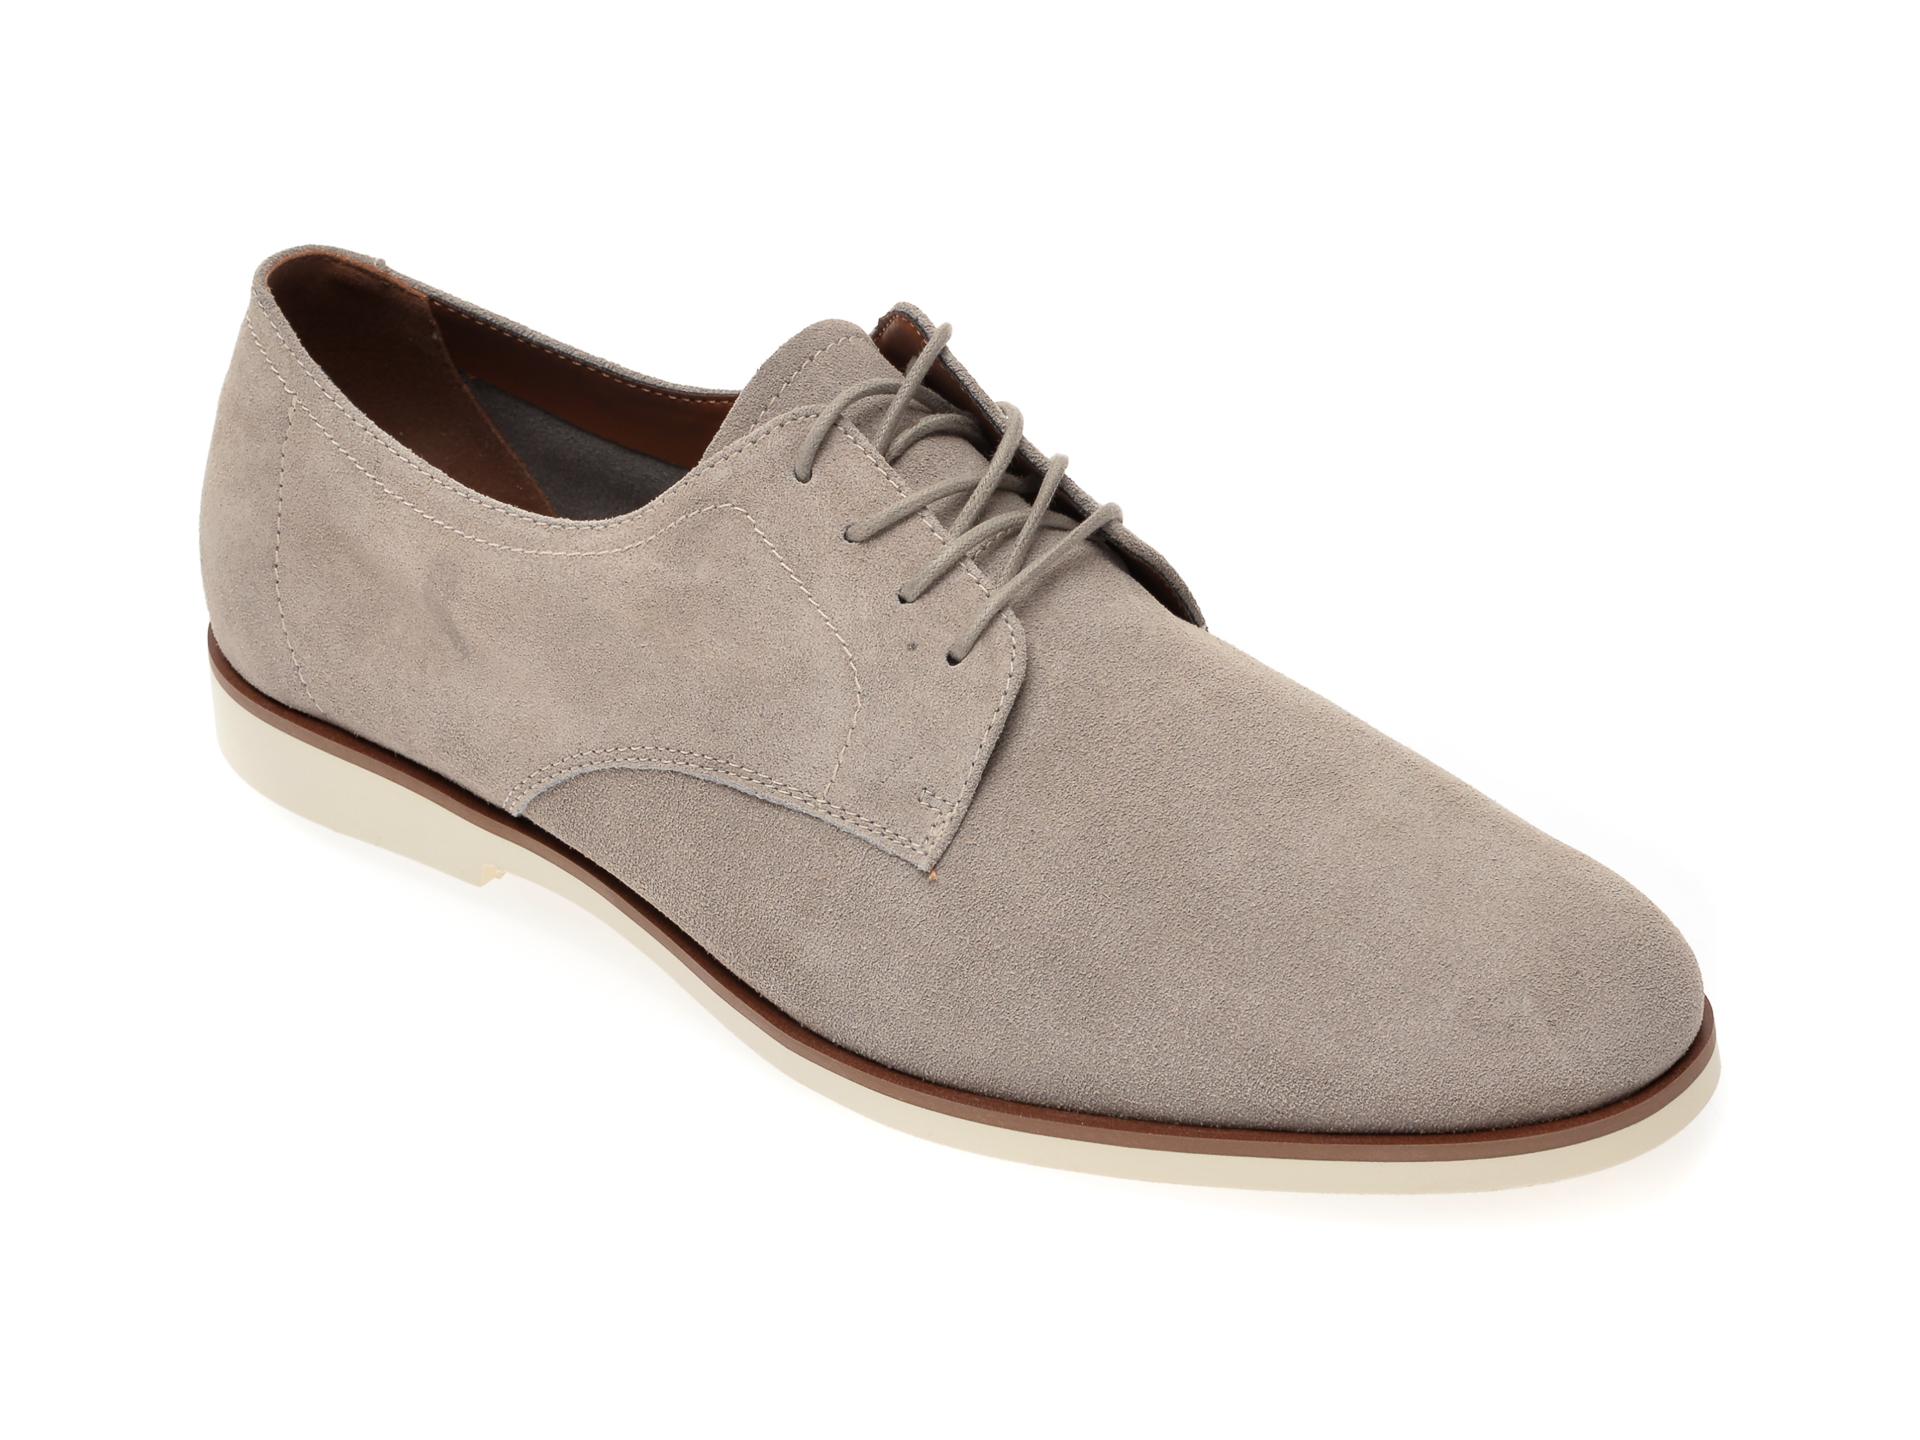 Pantofi ALDO gri, Dautovo020, din piele intoarsa imagine